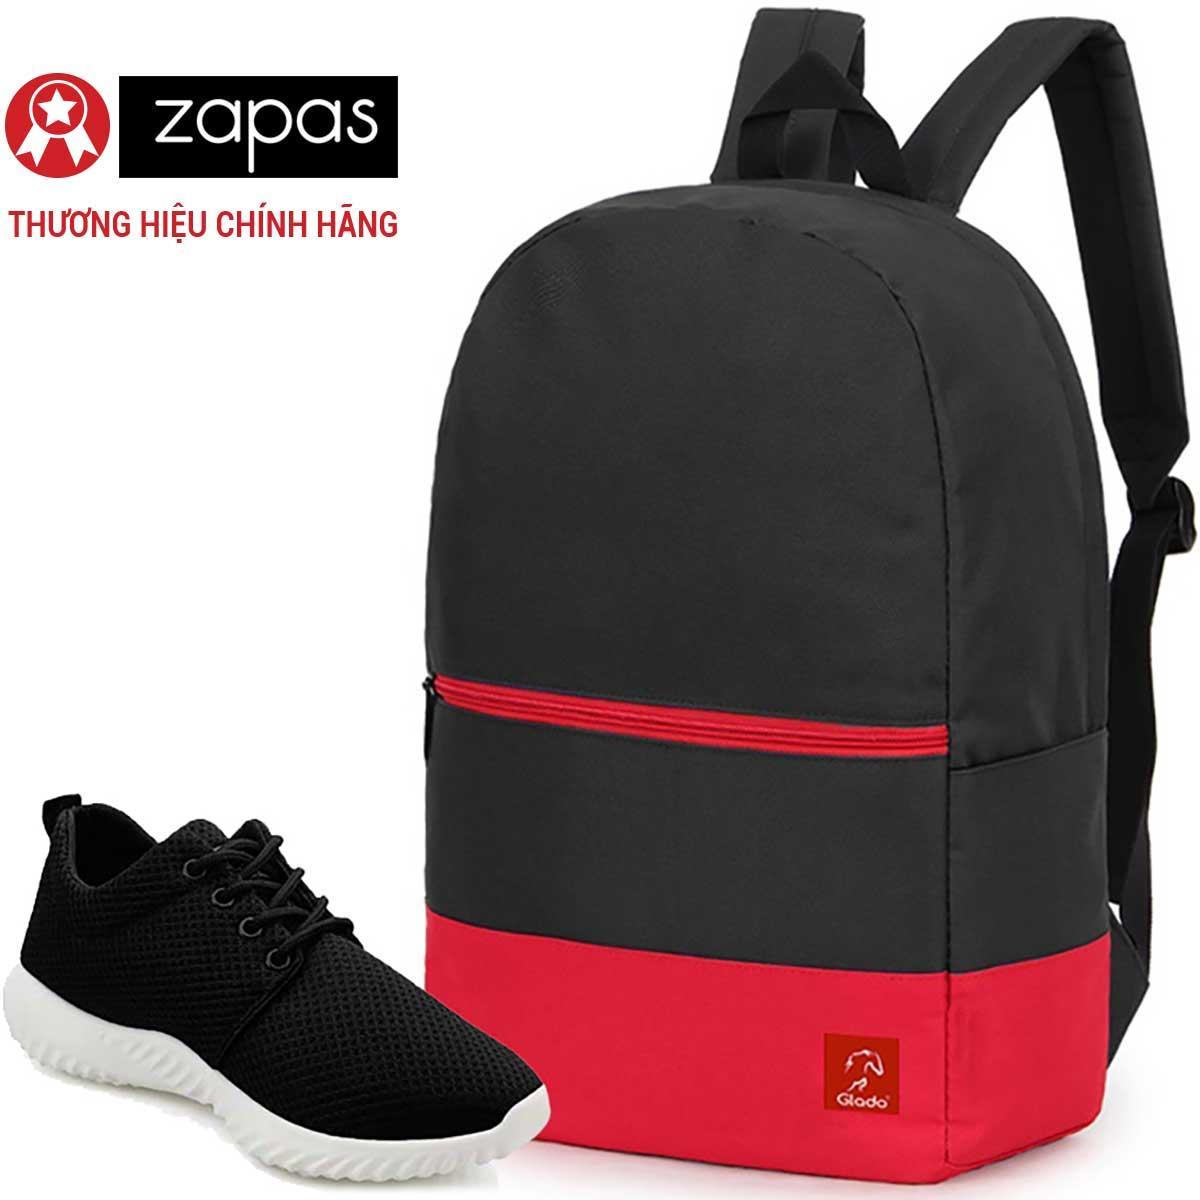 Bán Combo Balo Classical Bll007 Đen Phối Đỏ Giay Sneaker Zapas Gs062 Đen Cb231 Rẻ Trong Hồ Chí Minh